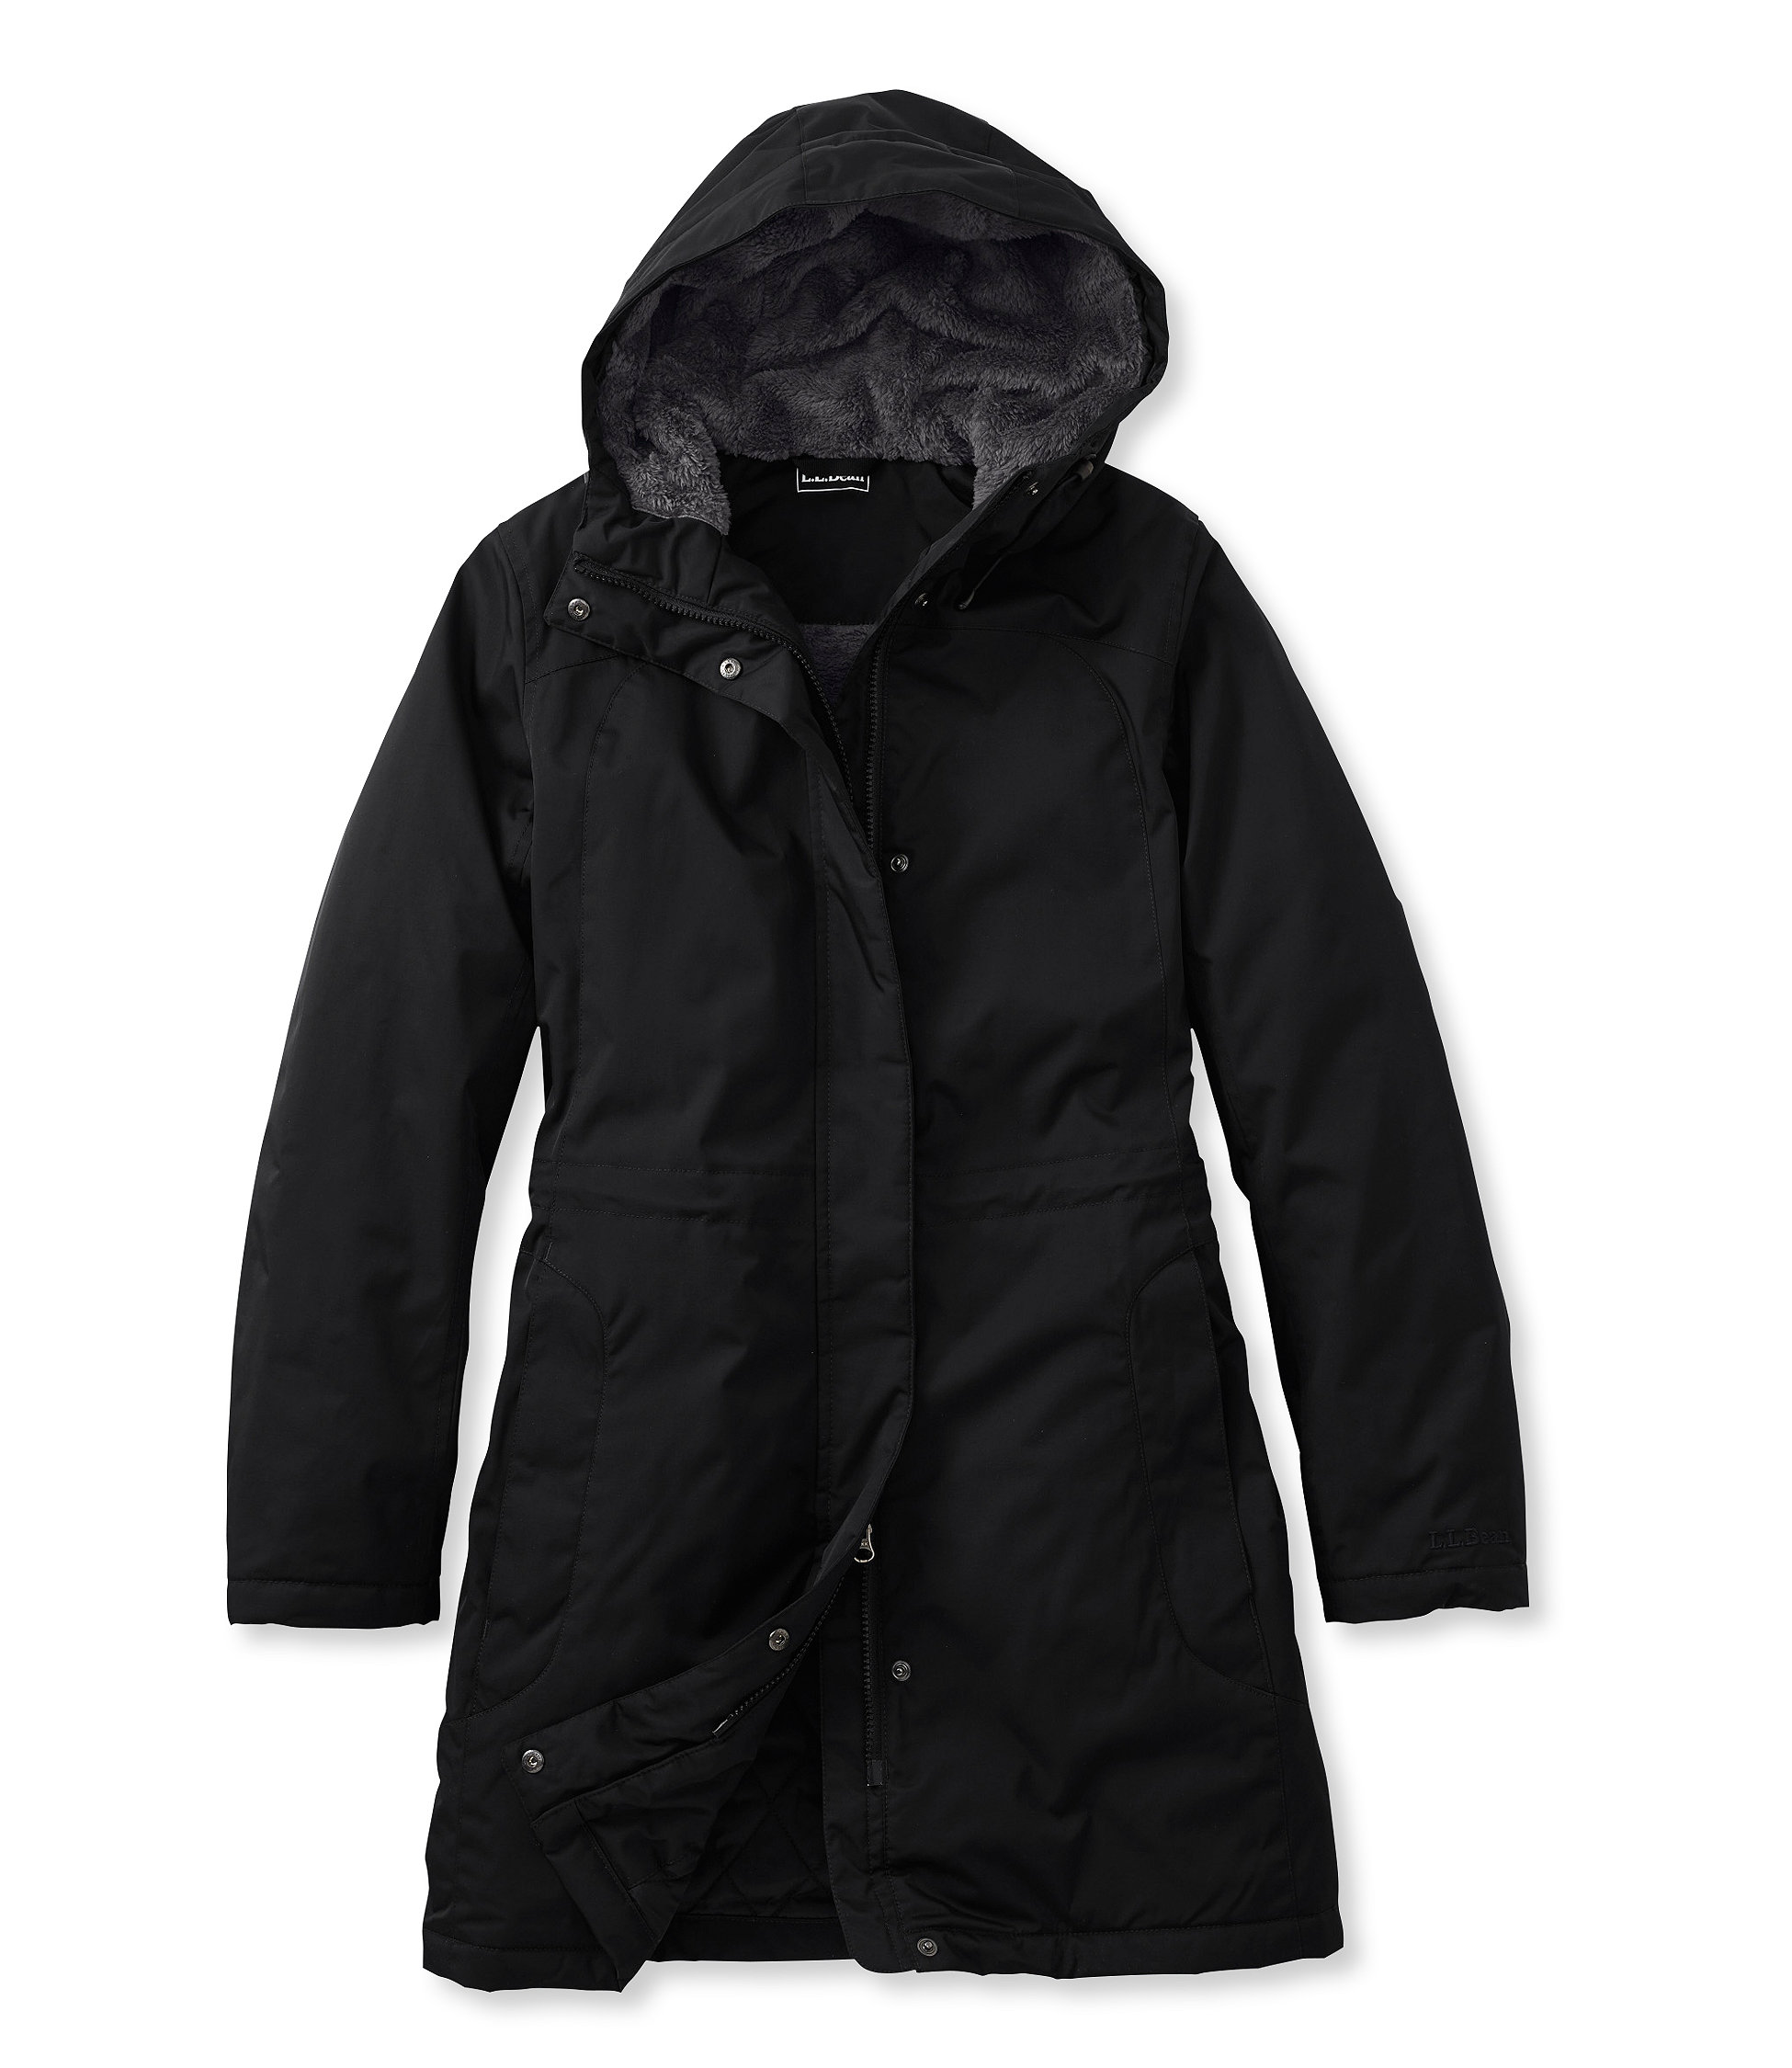 L.L.Bean Winter Warmer Coat